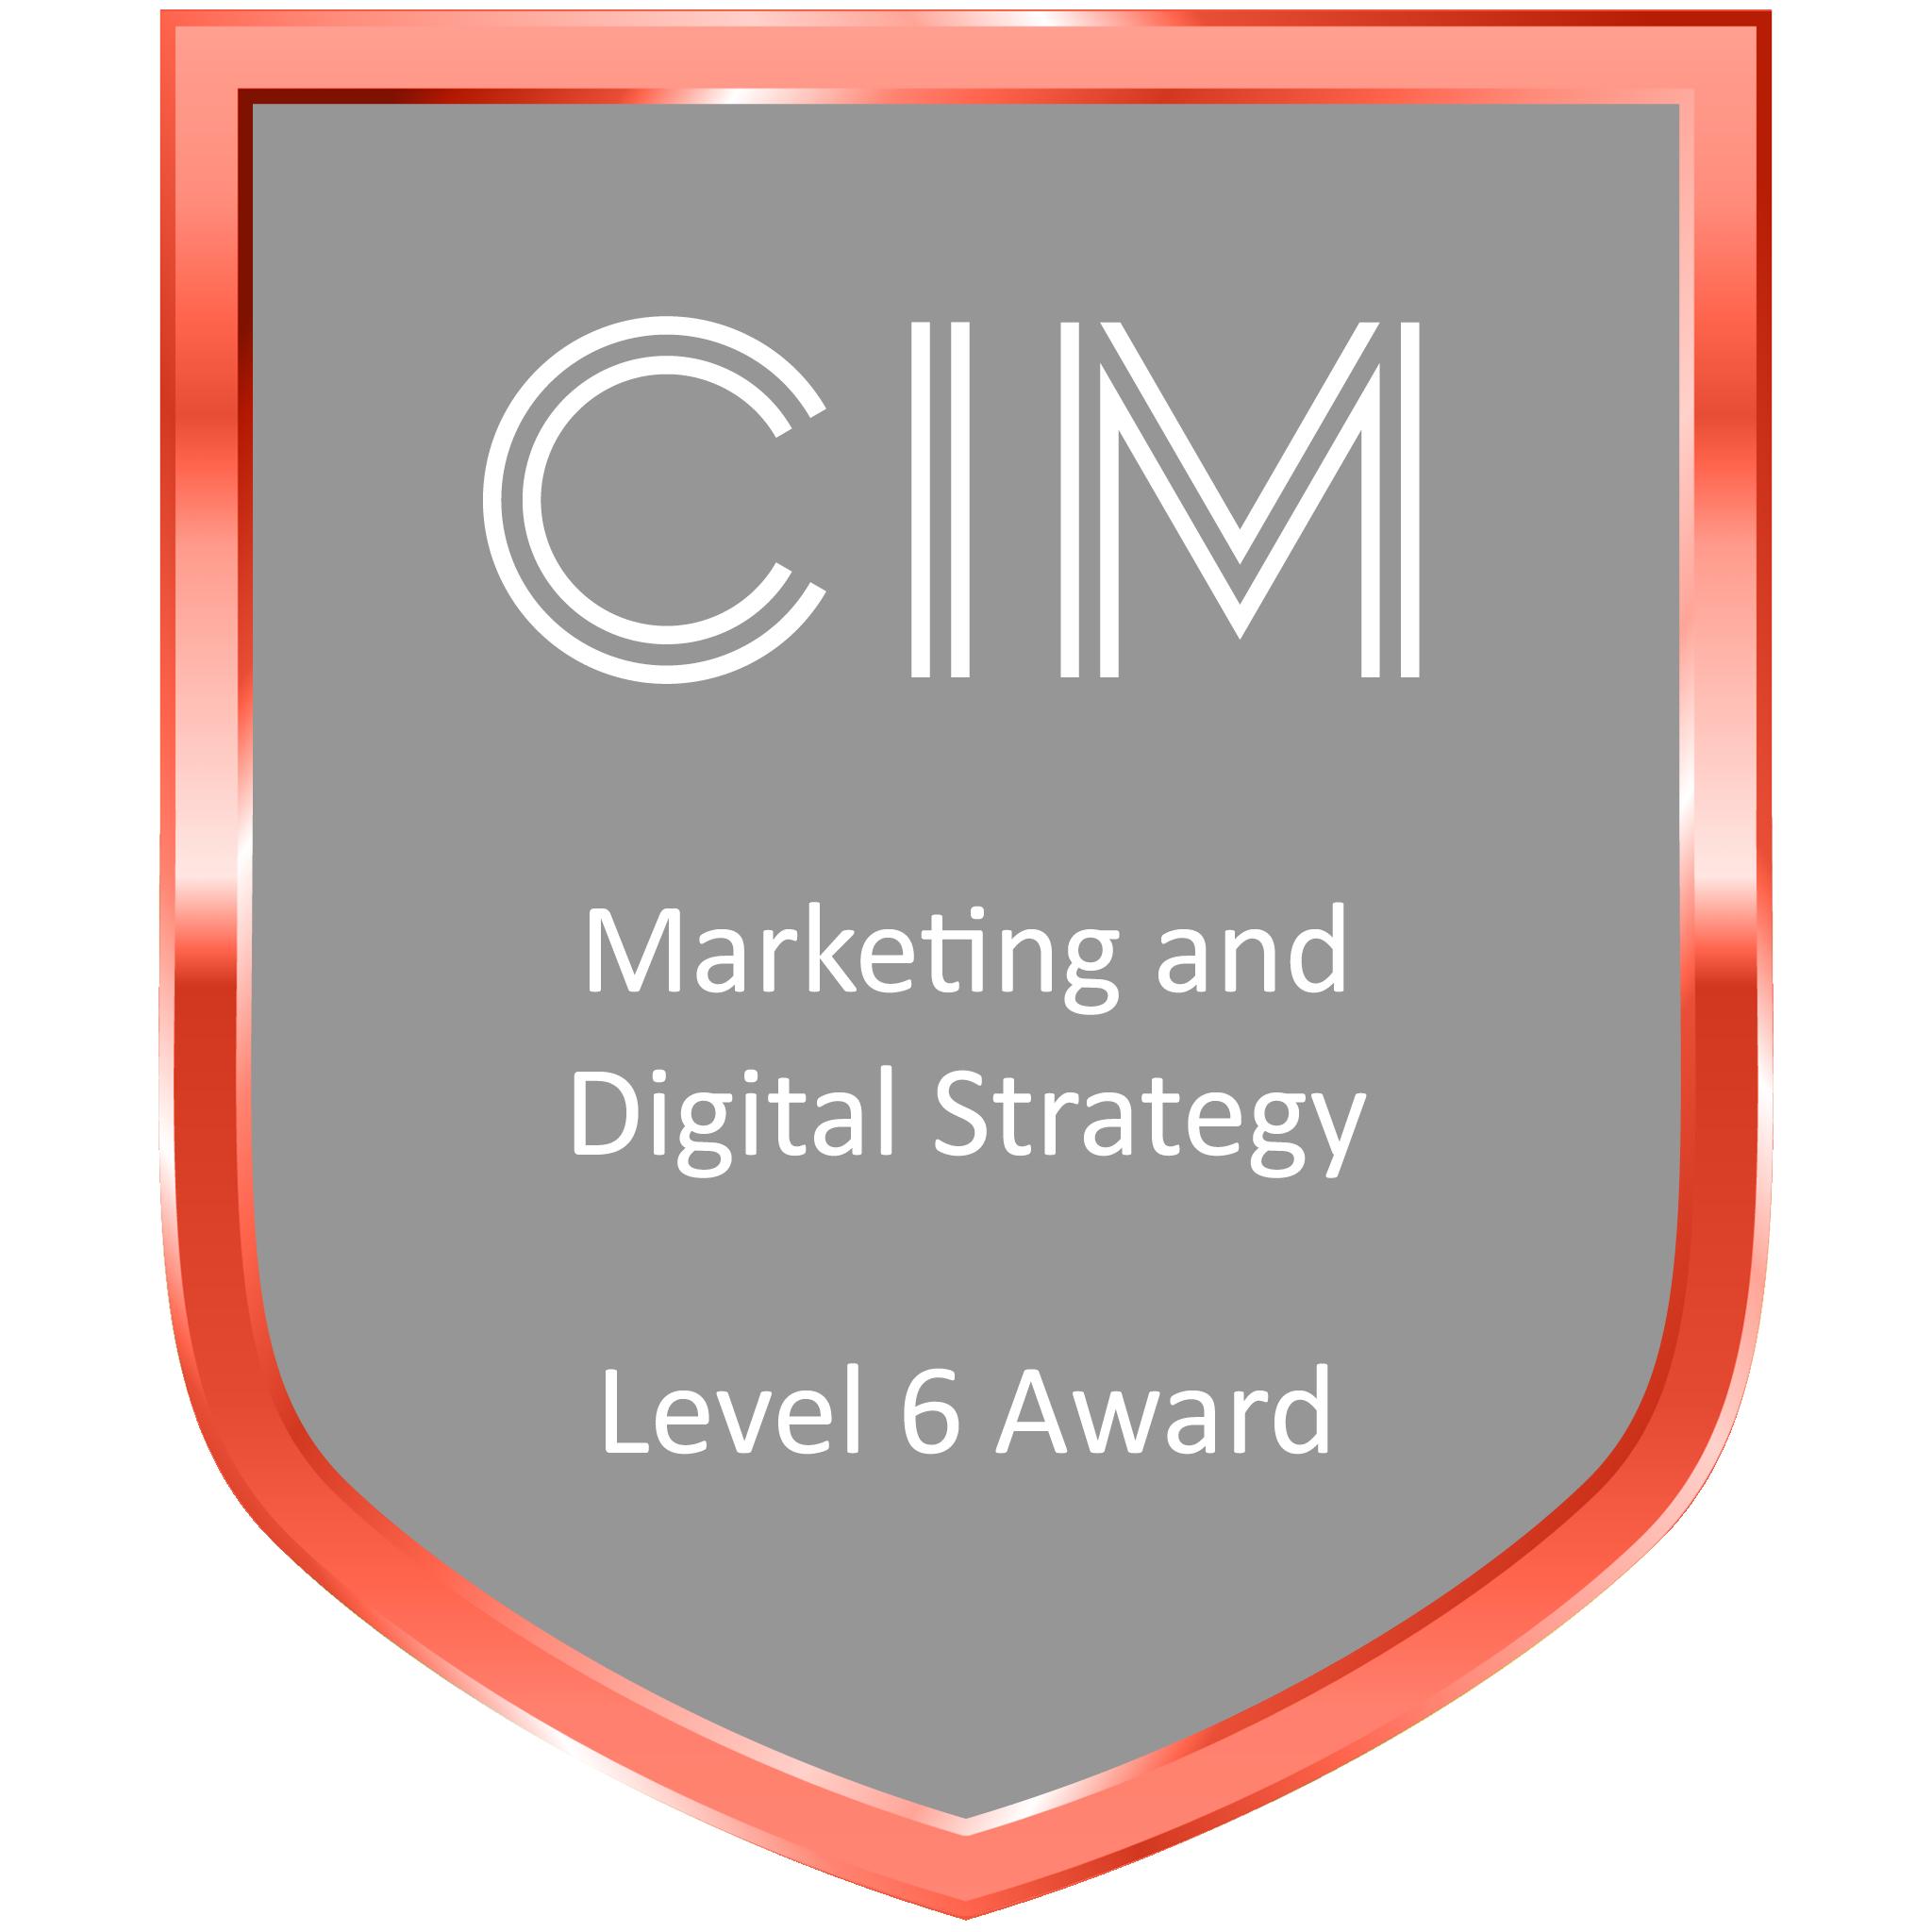 Marketing and Digital Strategy